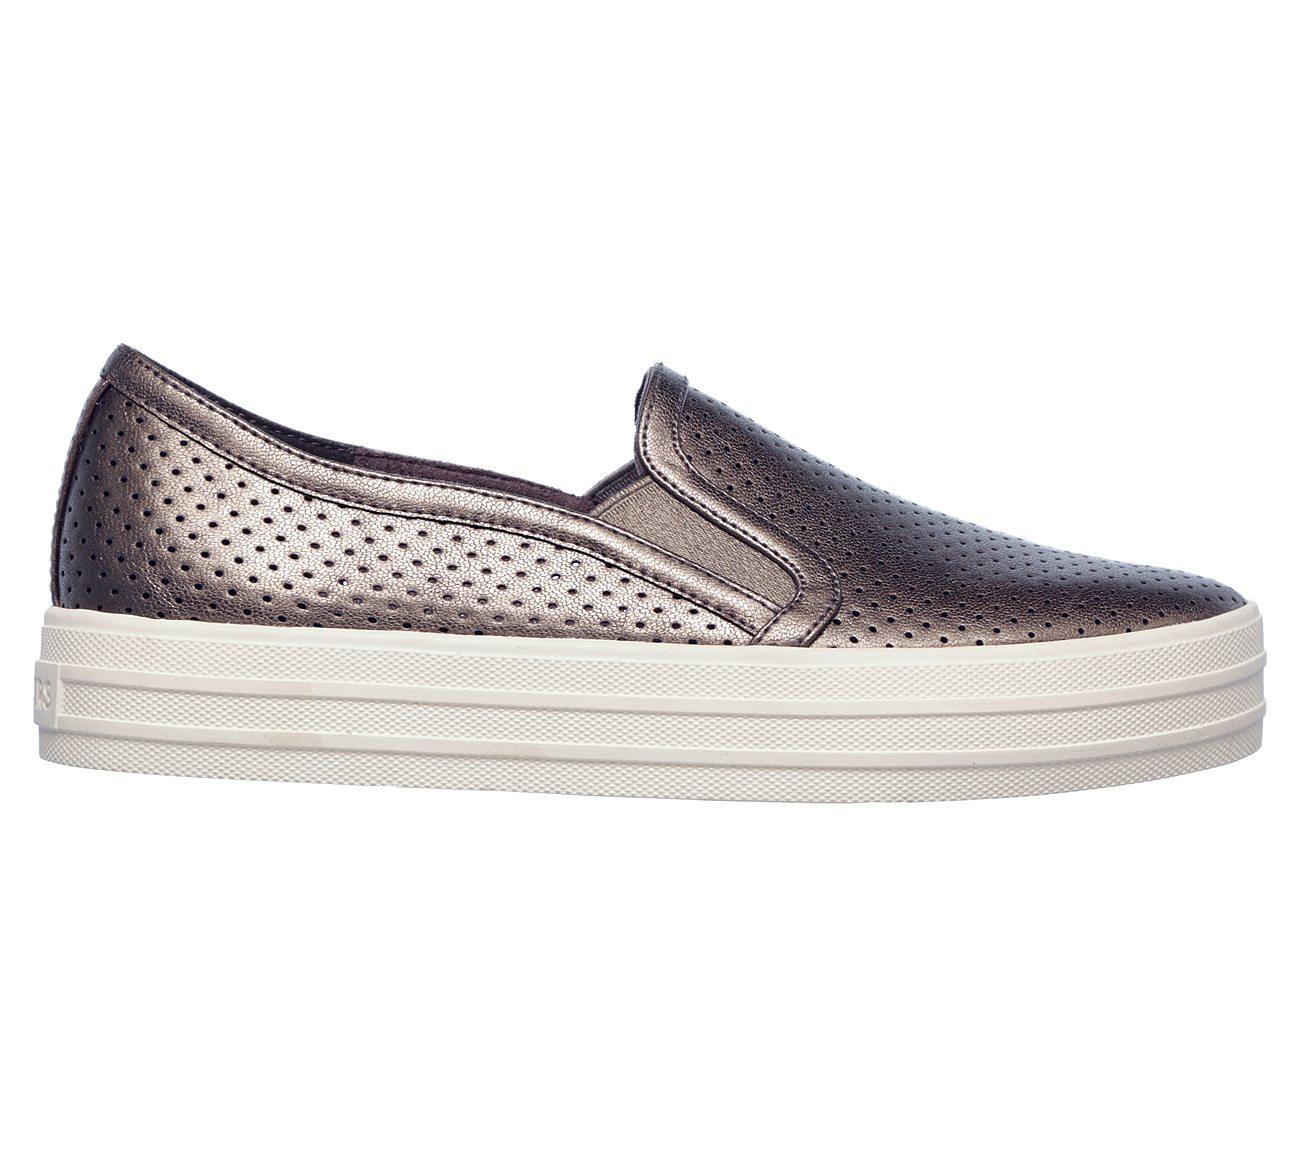 Skechers Double Up Metallic Breeze Slip-On Sneaker (Women's) ibMHijK4a